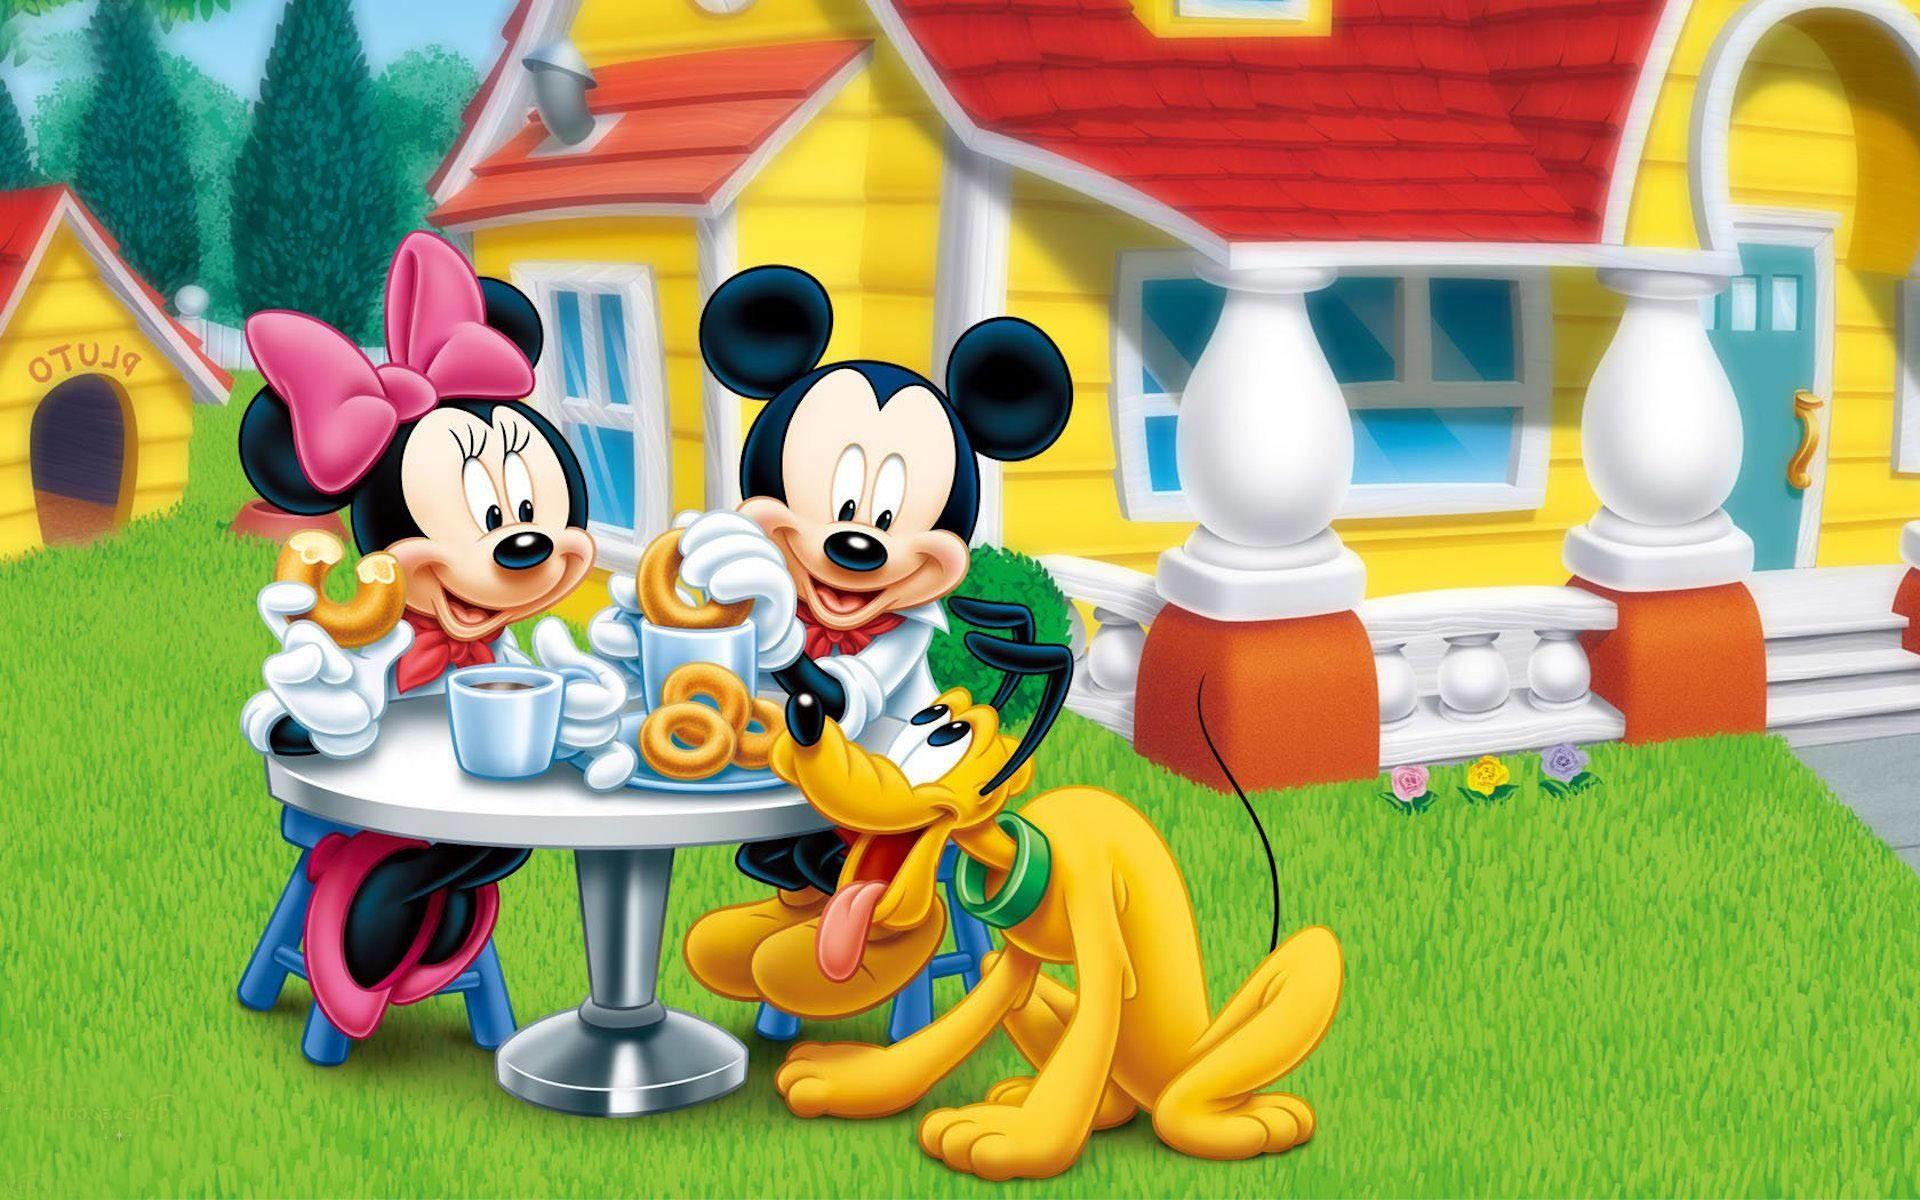 HD Wallpaper Cartoon Characters (70+ images)